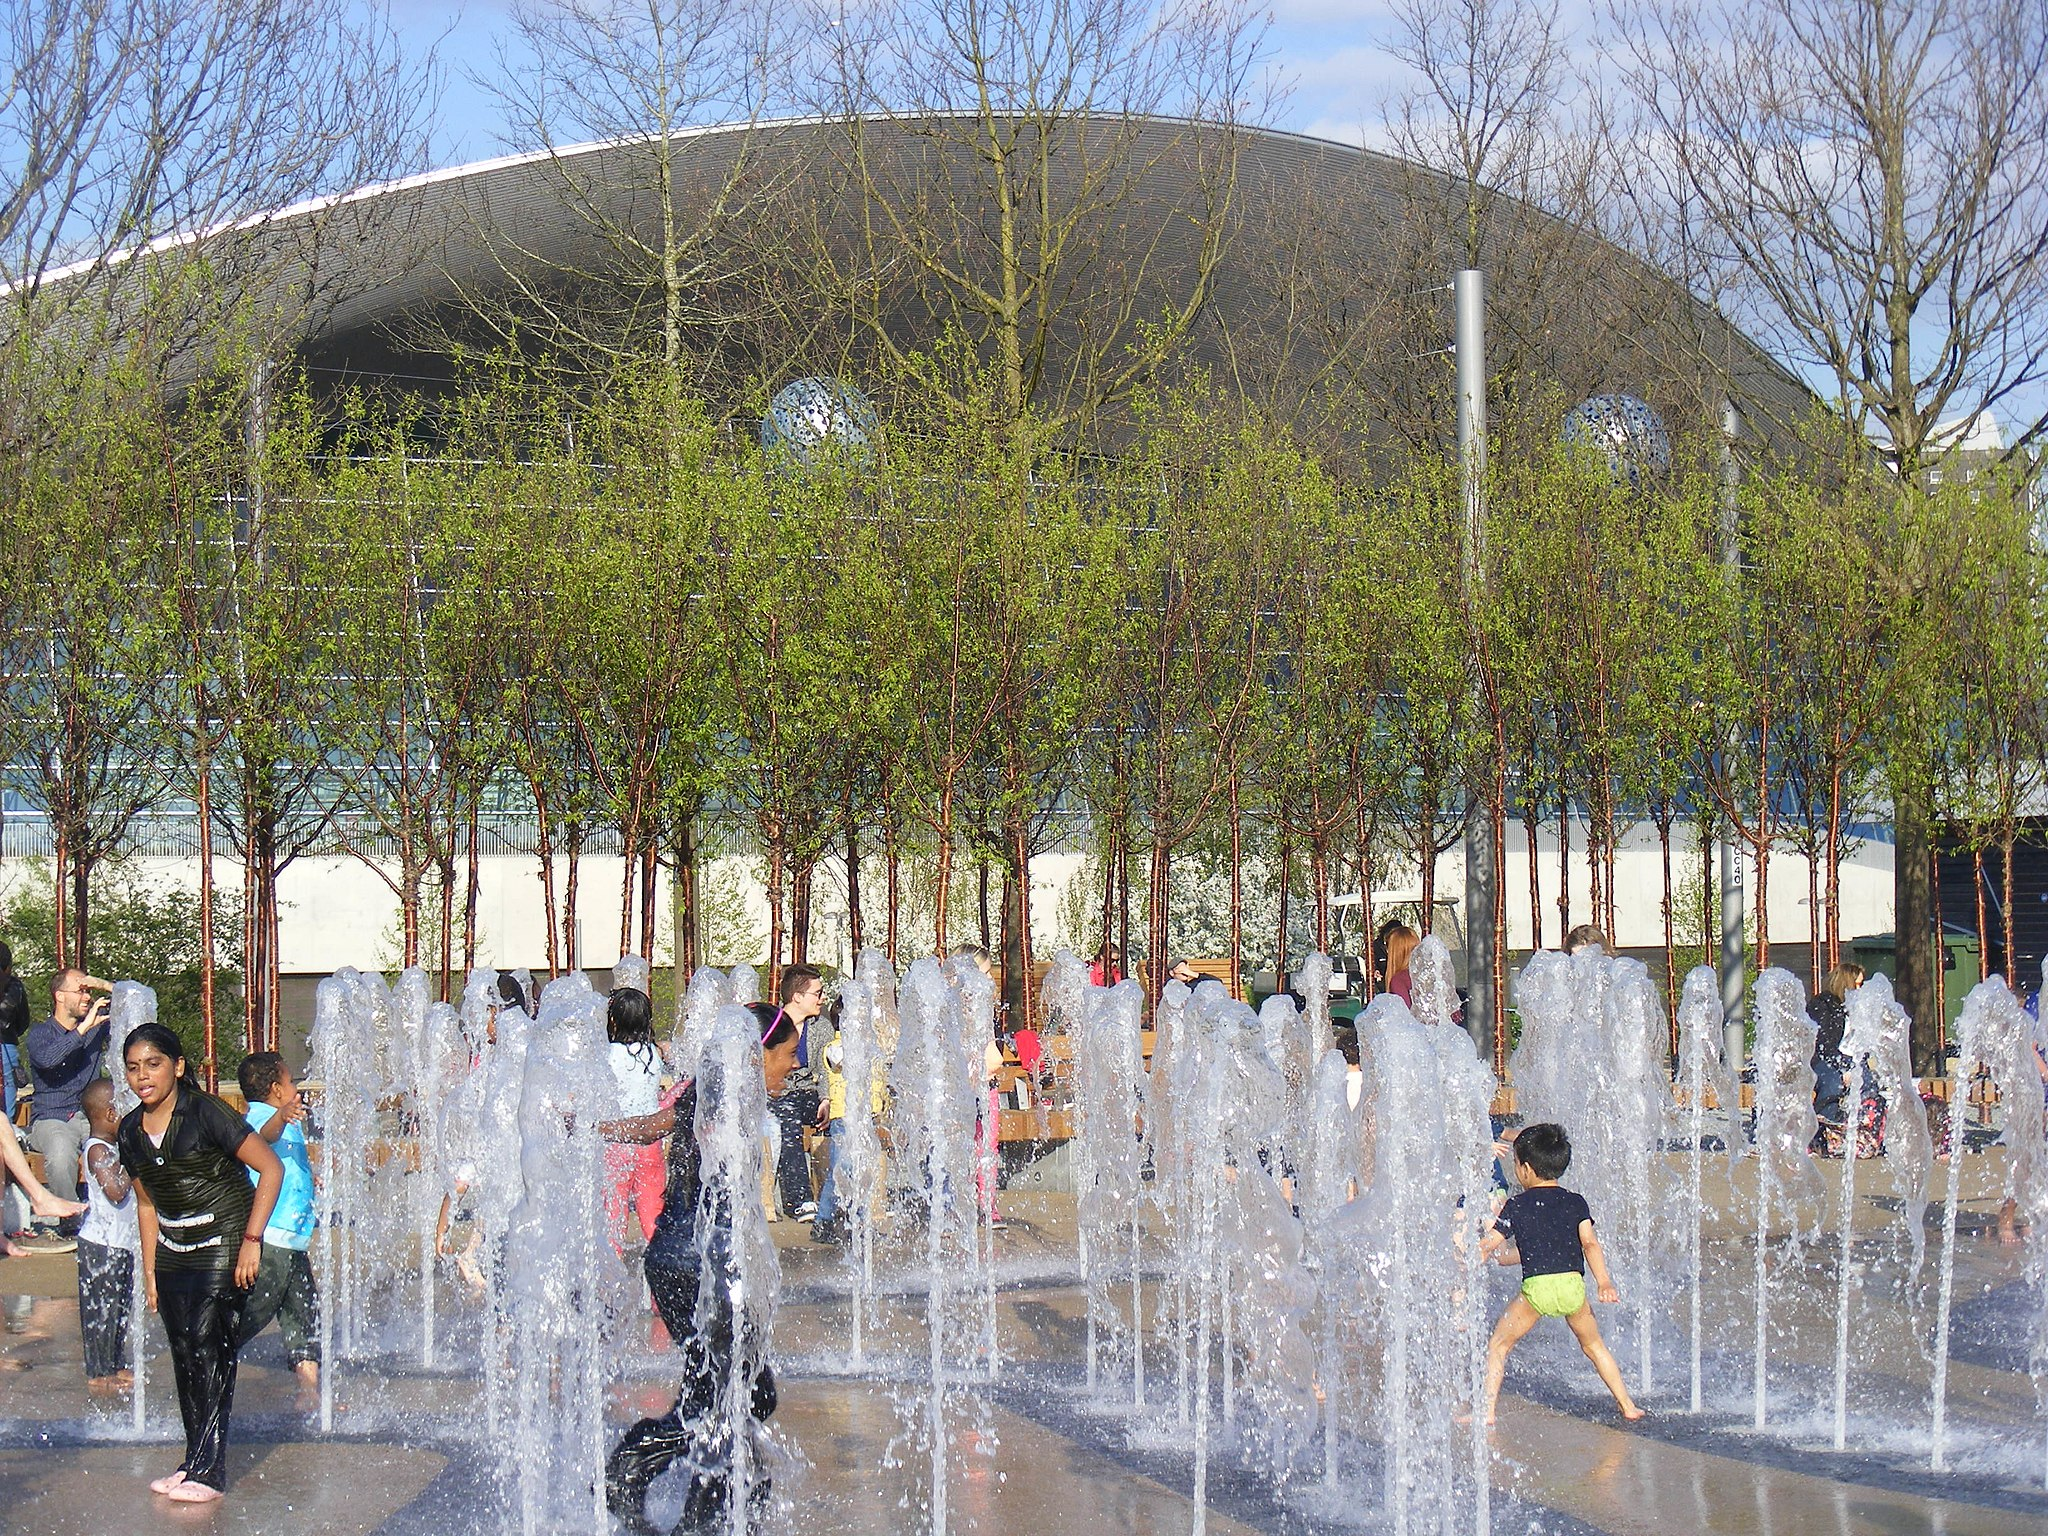 Queen_Elizabeth_Olympic_Park_(13763723503).jpg